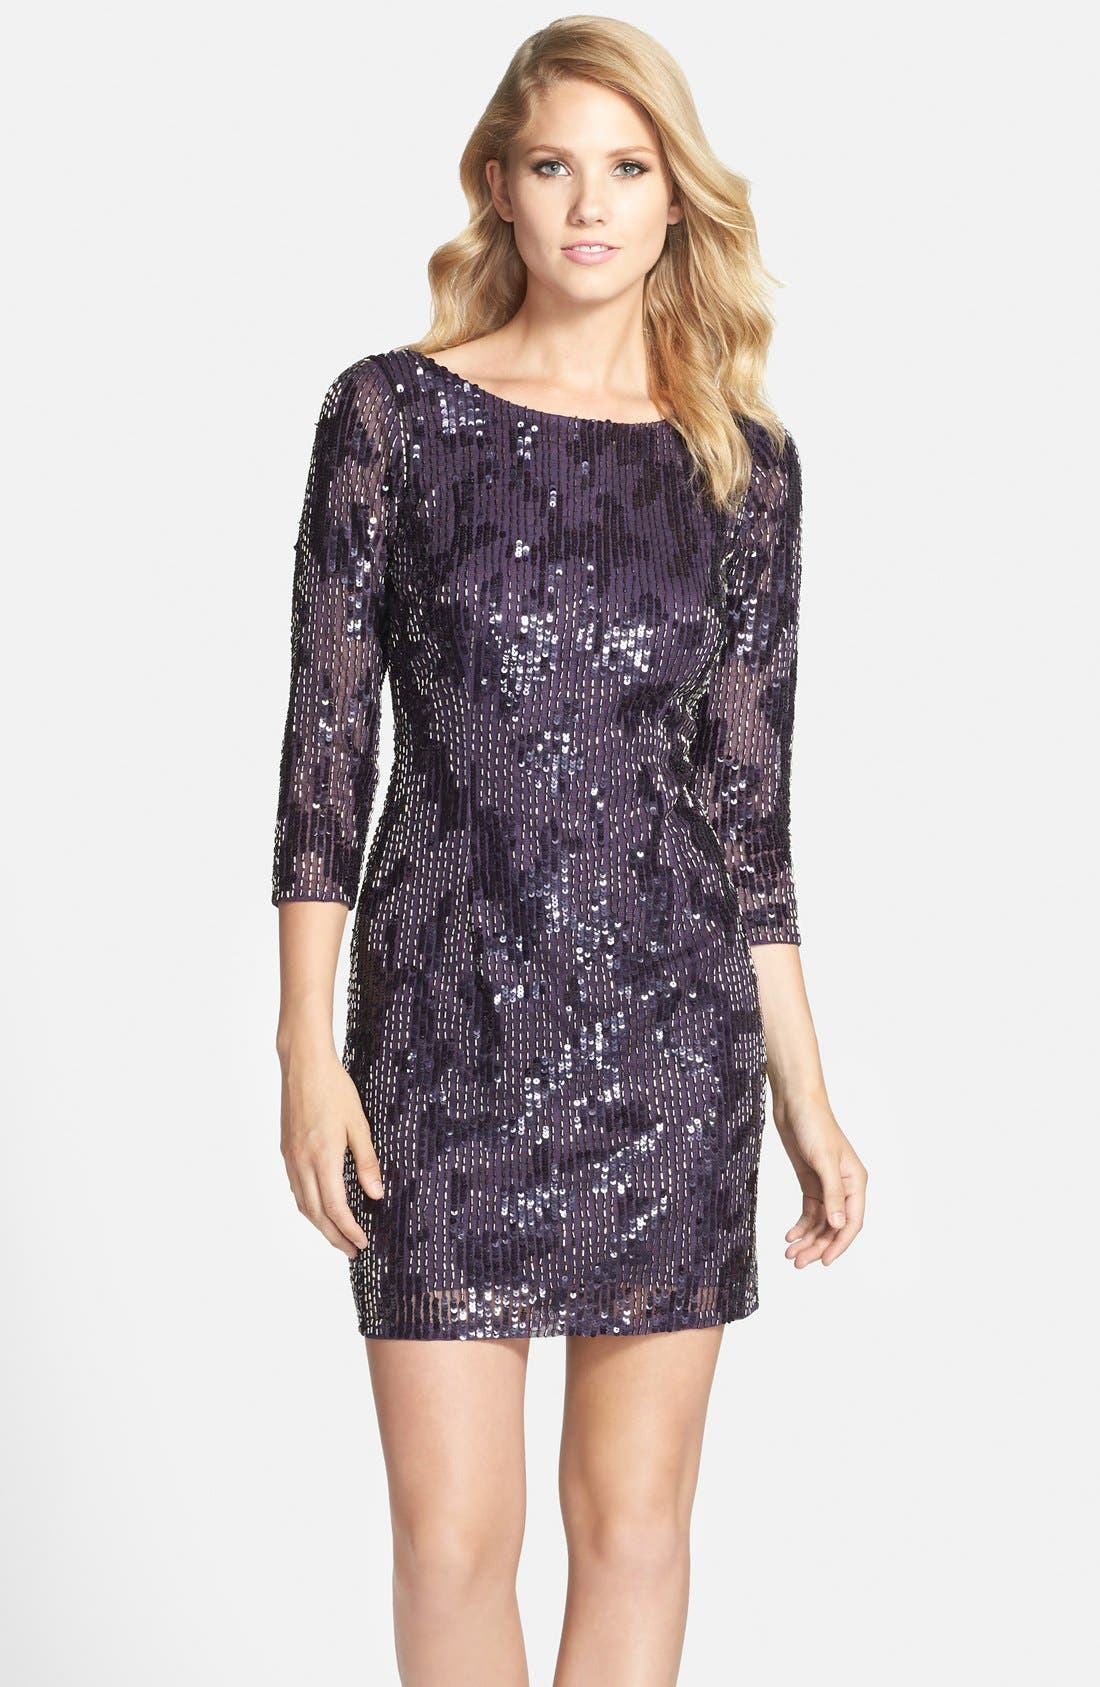 Alternate Image 1 Selected - Adrianna Papell Embellished Sheath Dress (Regular & Petite)